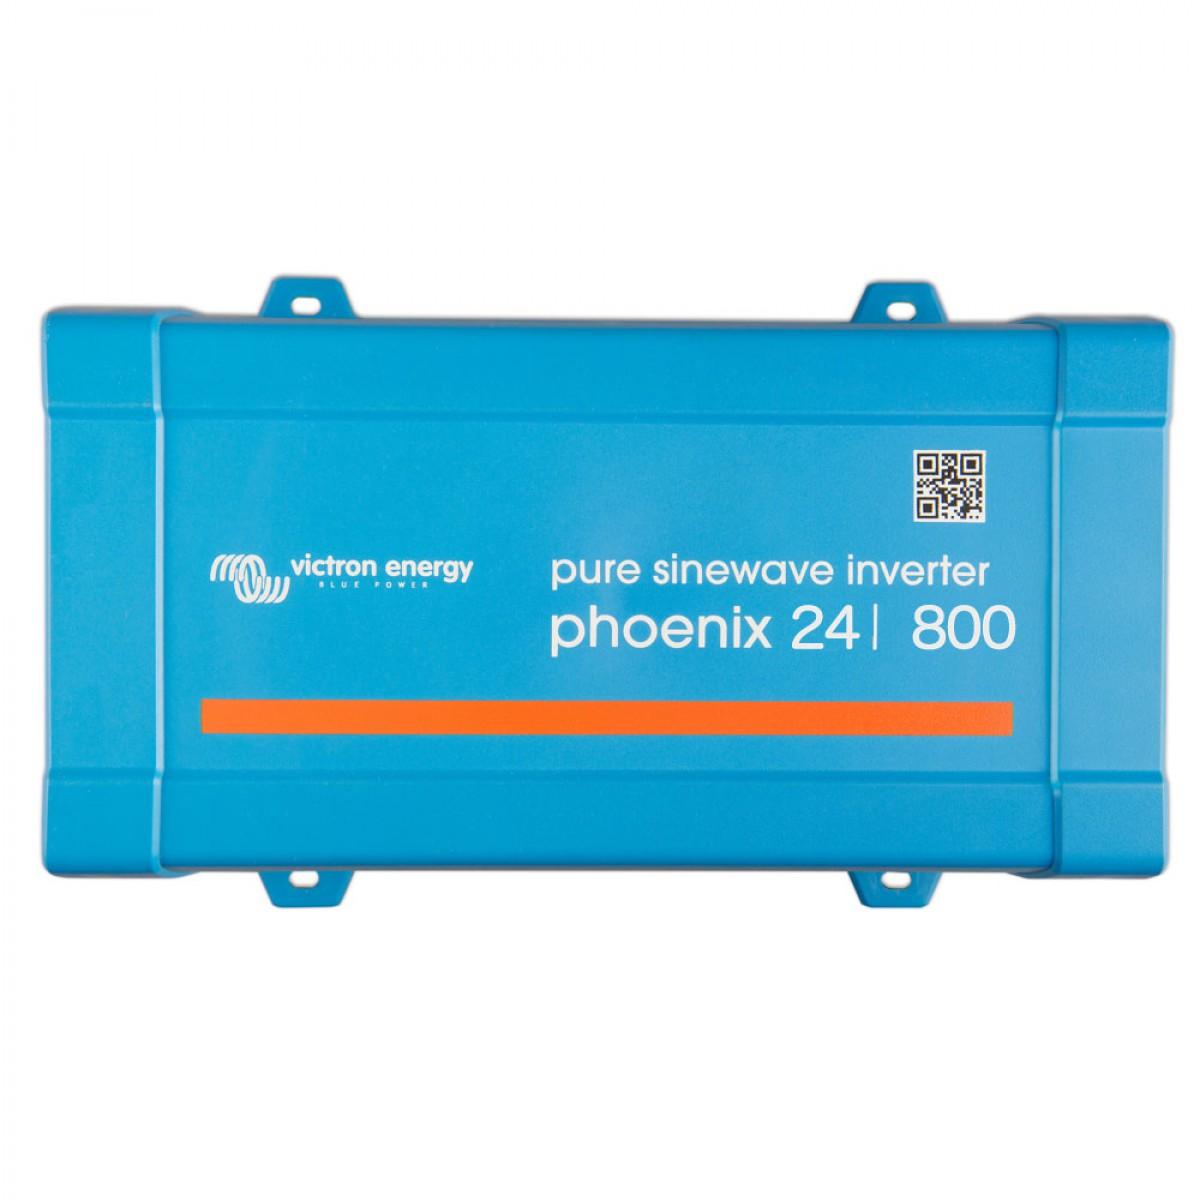 1 Stk Inselwechselrichter 24V 800W PVBI80024-